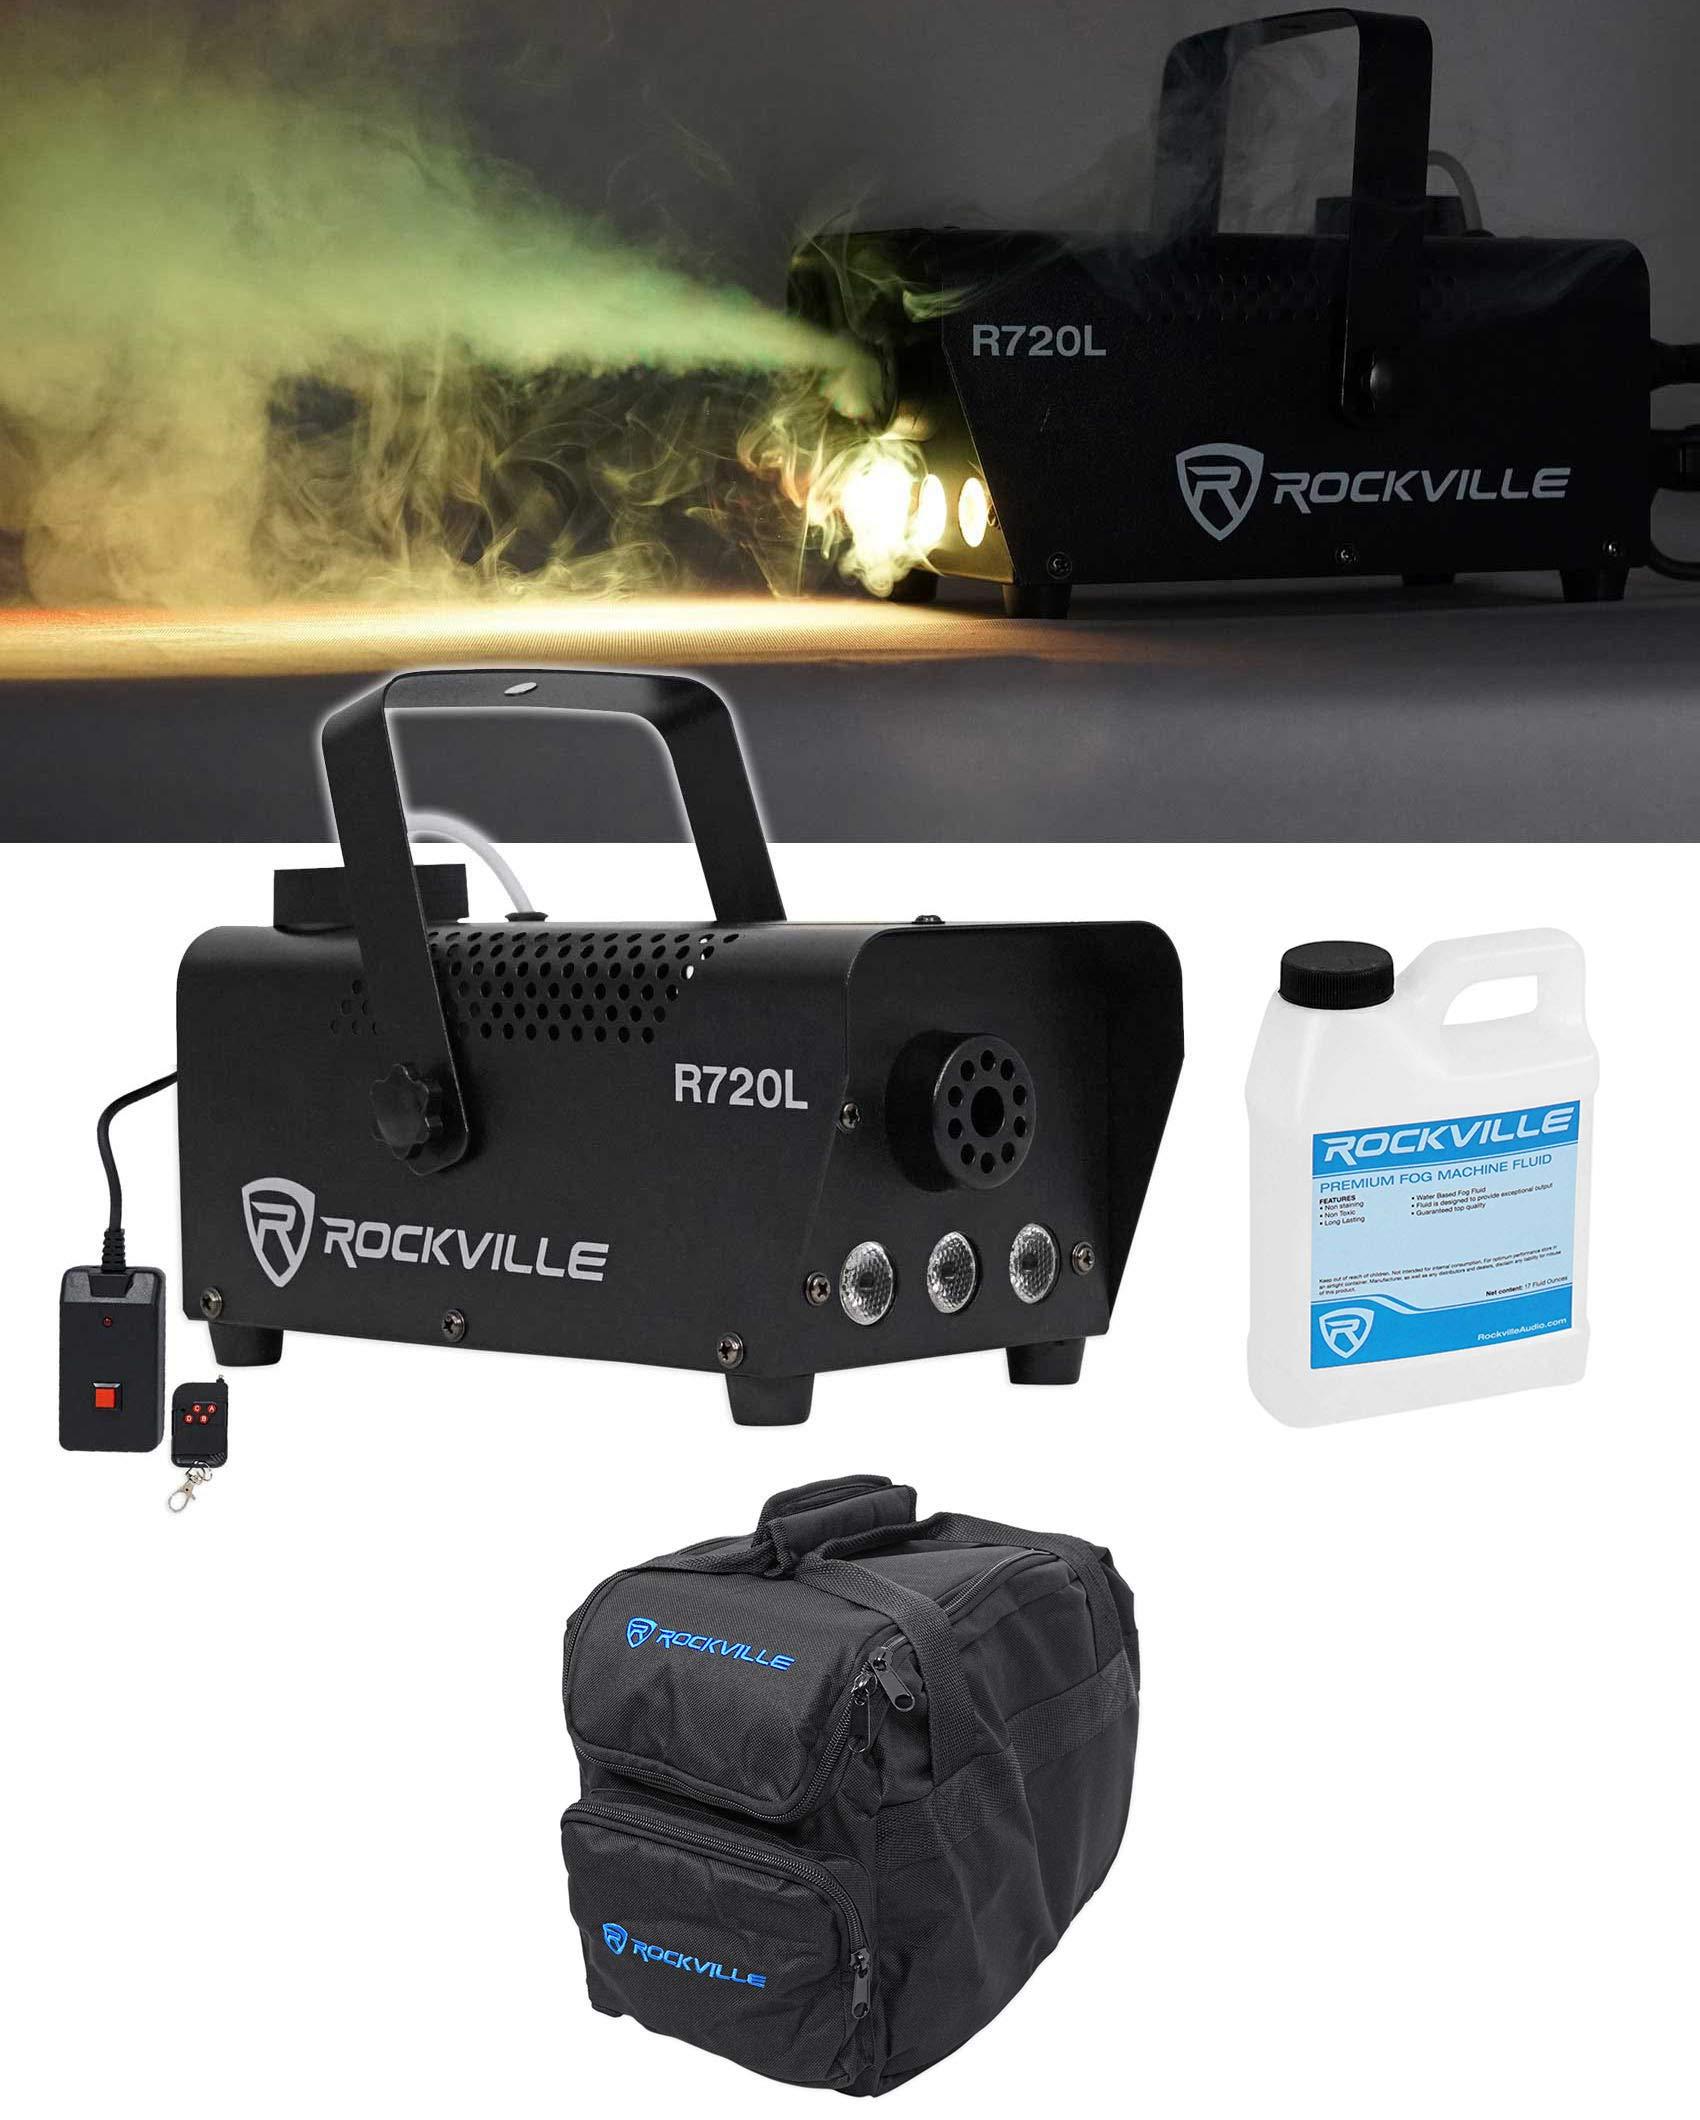 Rockville R720L Fog/Smoke Machine w/Remote+Fluid+Multi Color LED's+Carry Bag by Rockville